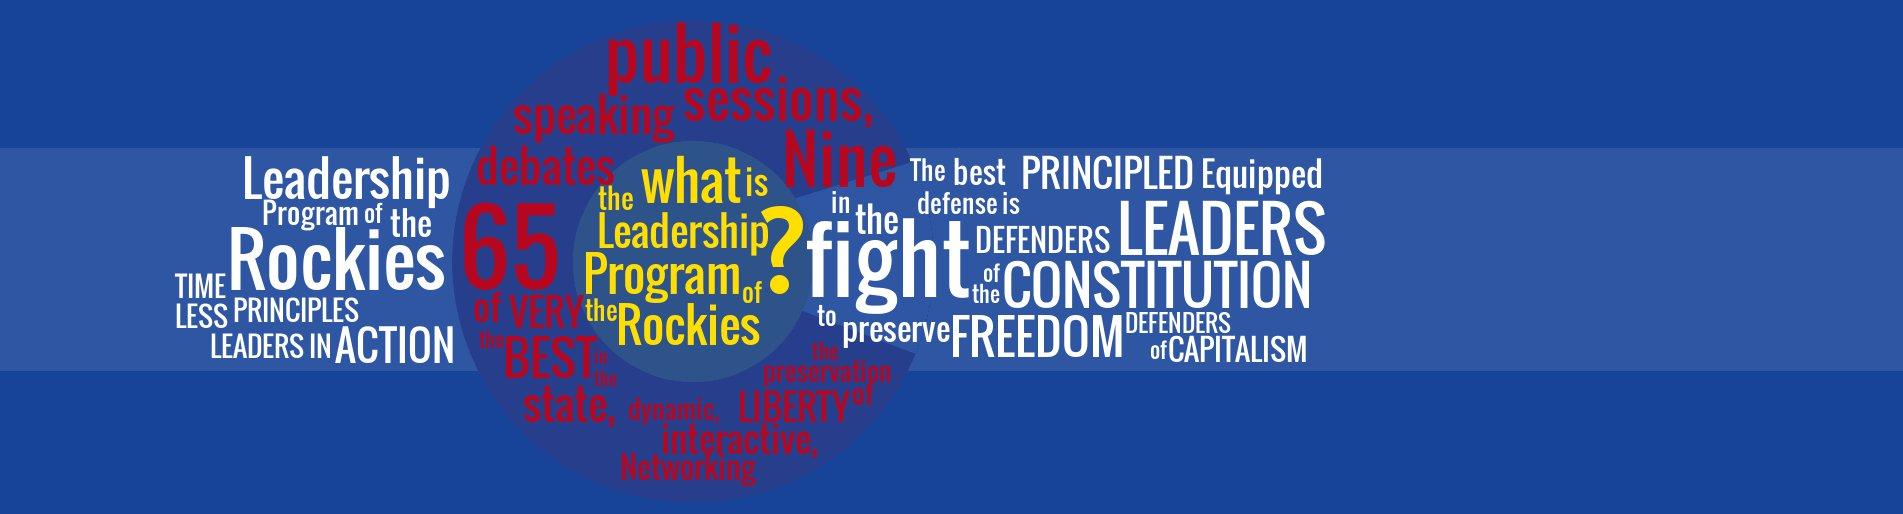 Apply Online to Leadership Program of the Rockies